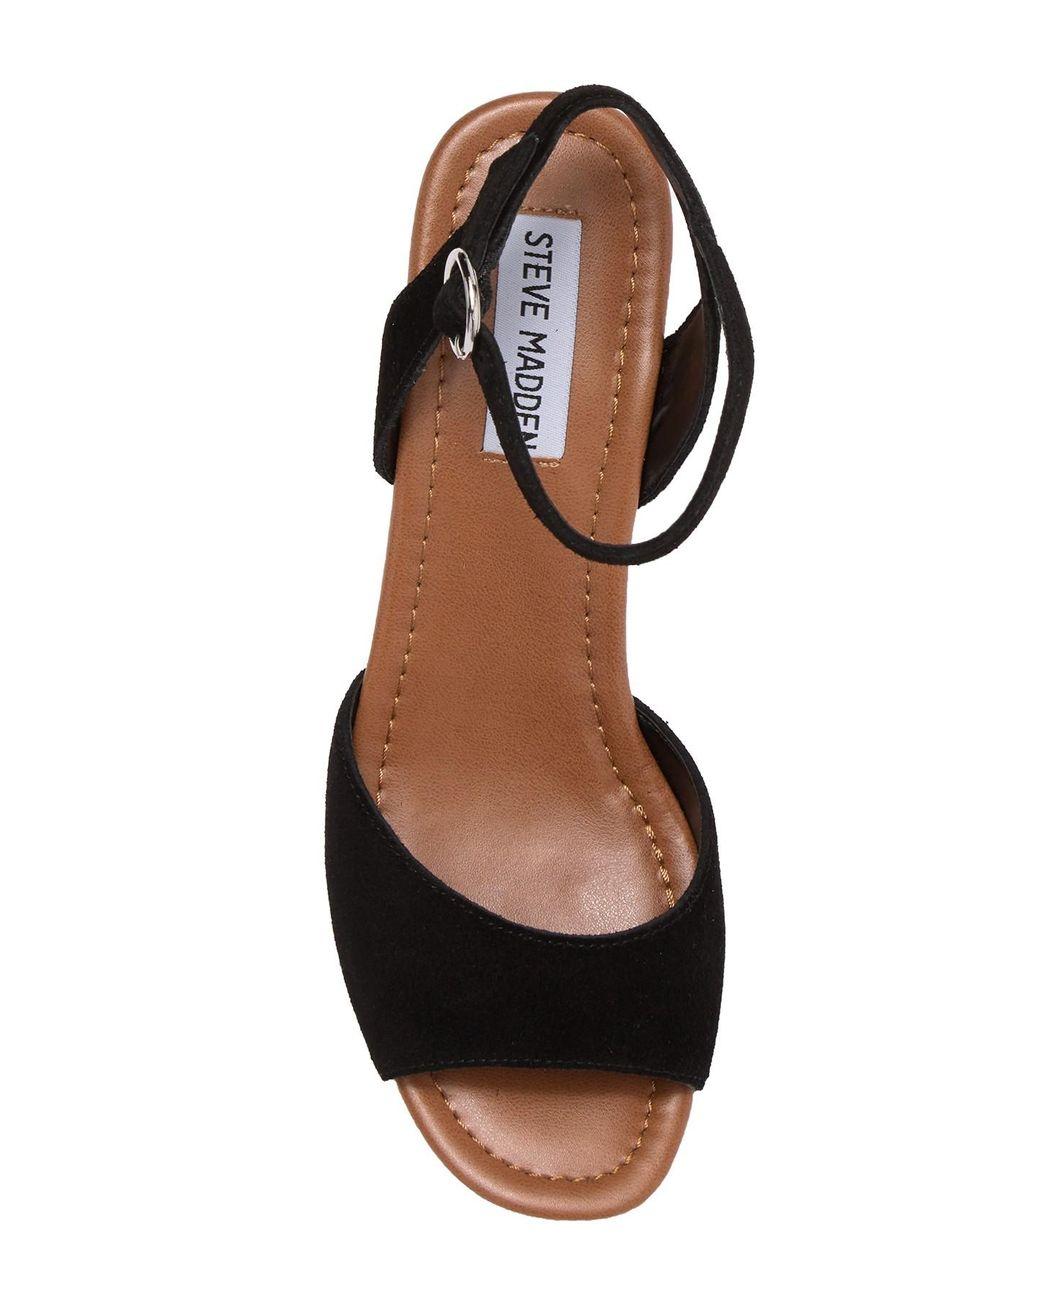 Open Toe Black Lonnie Women's Clog Sandal v0mwnON8y